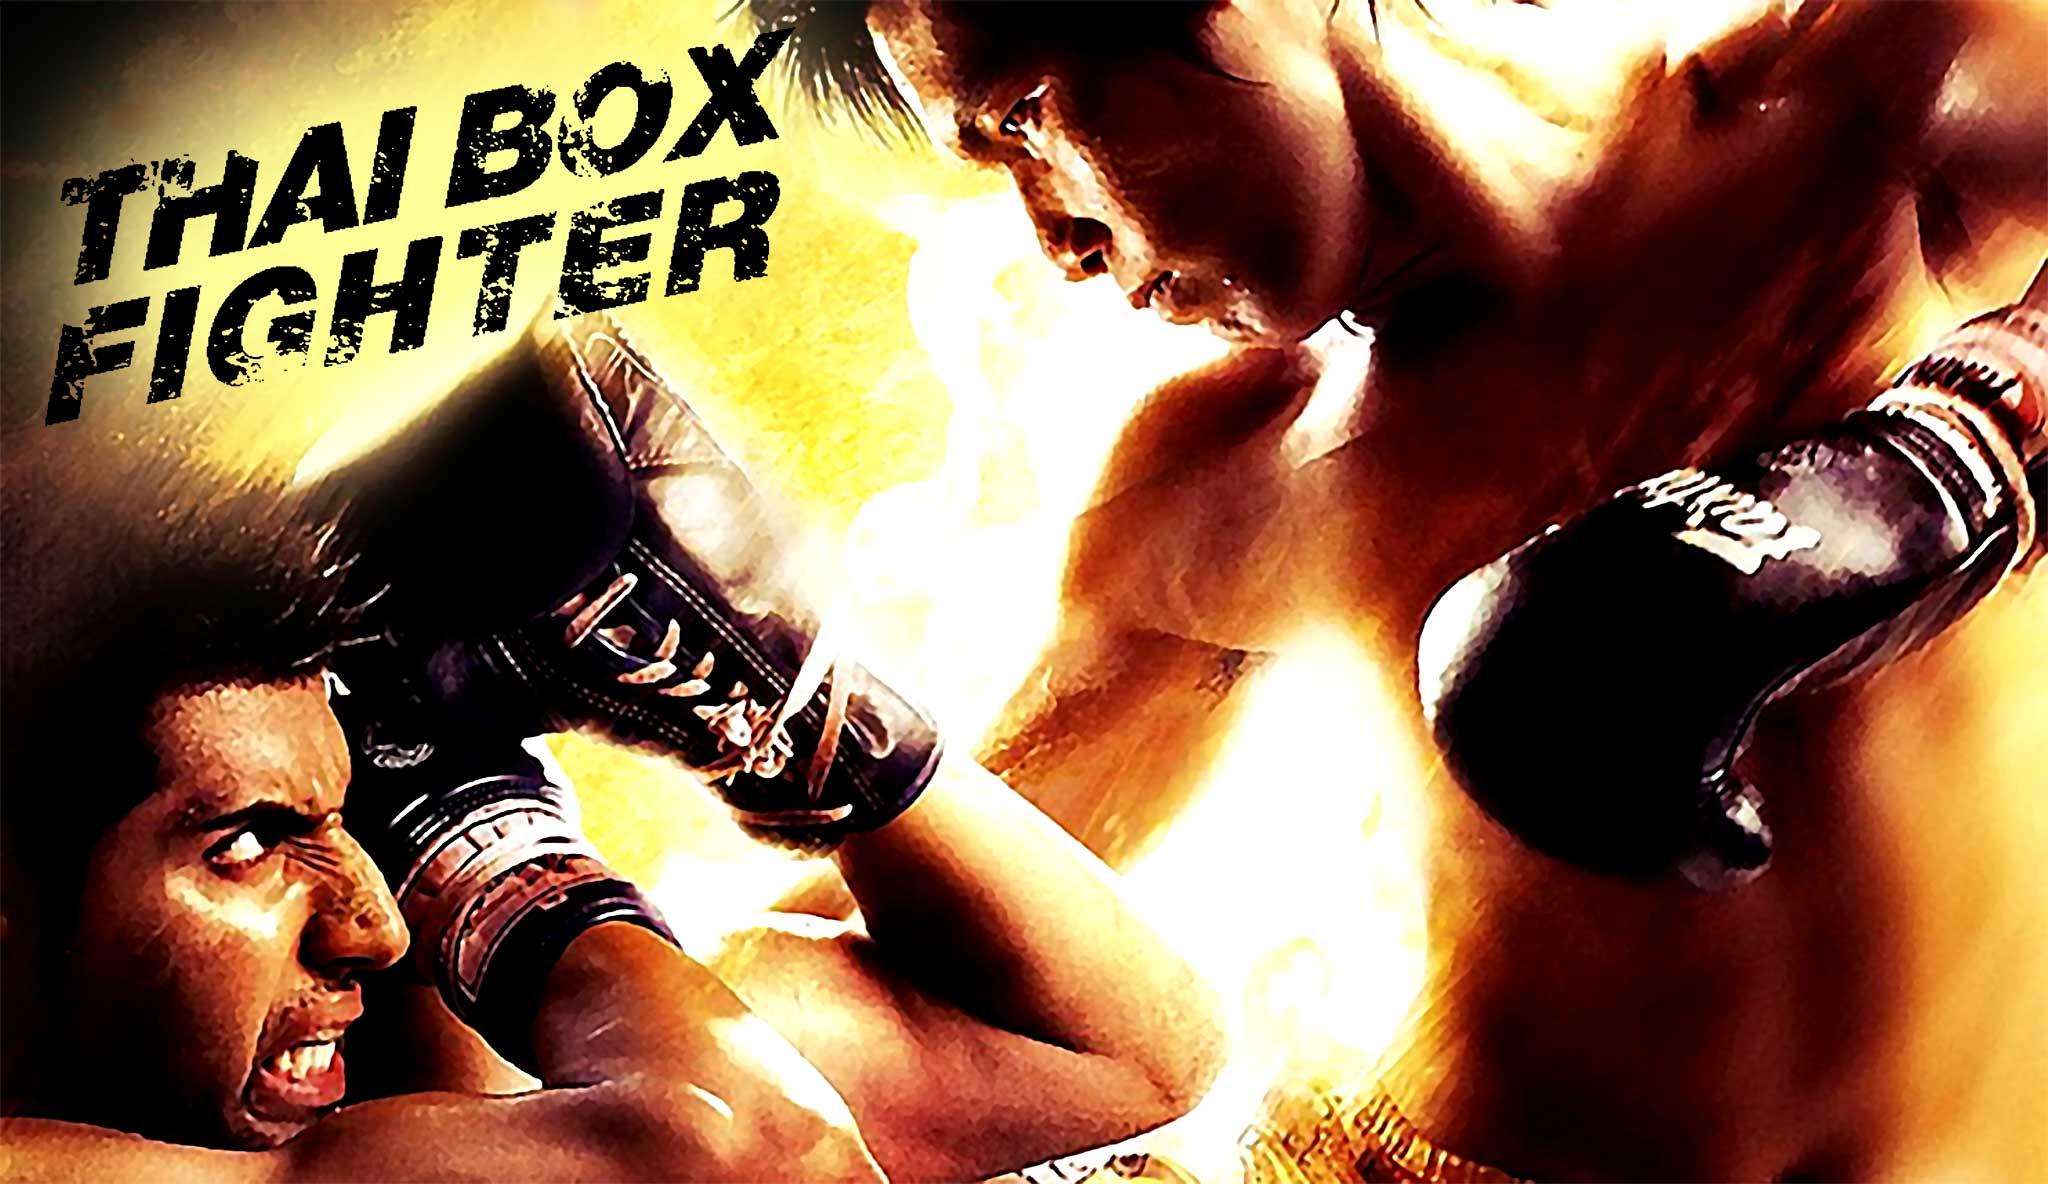 thai-box-fighter\header.jpg